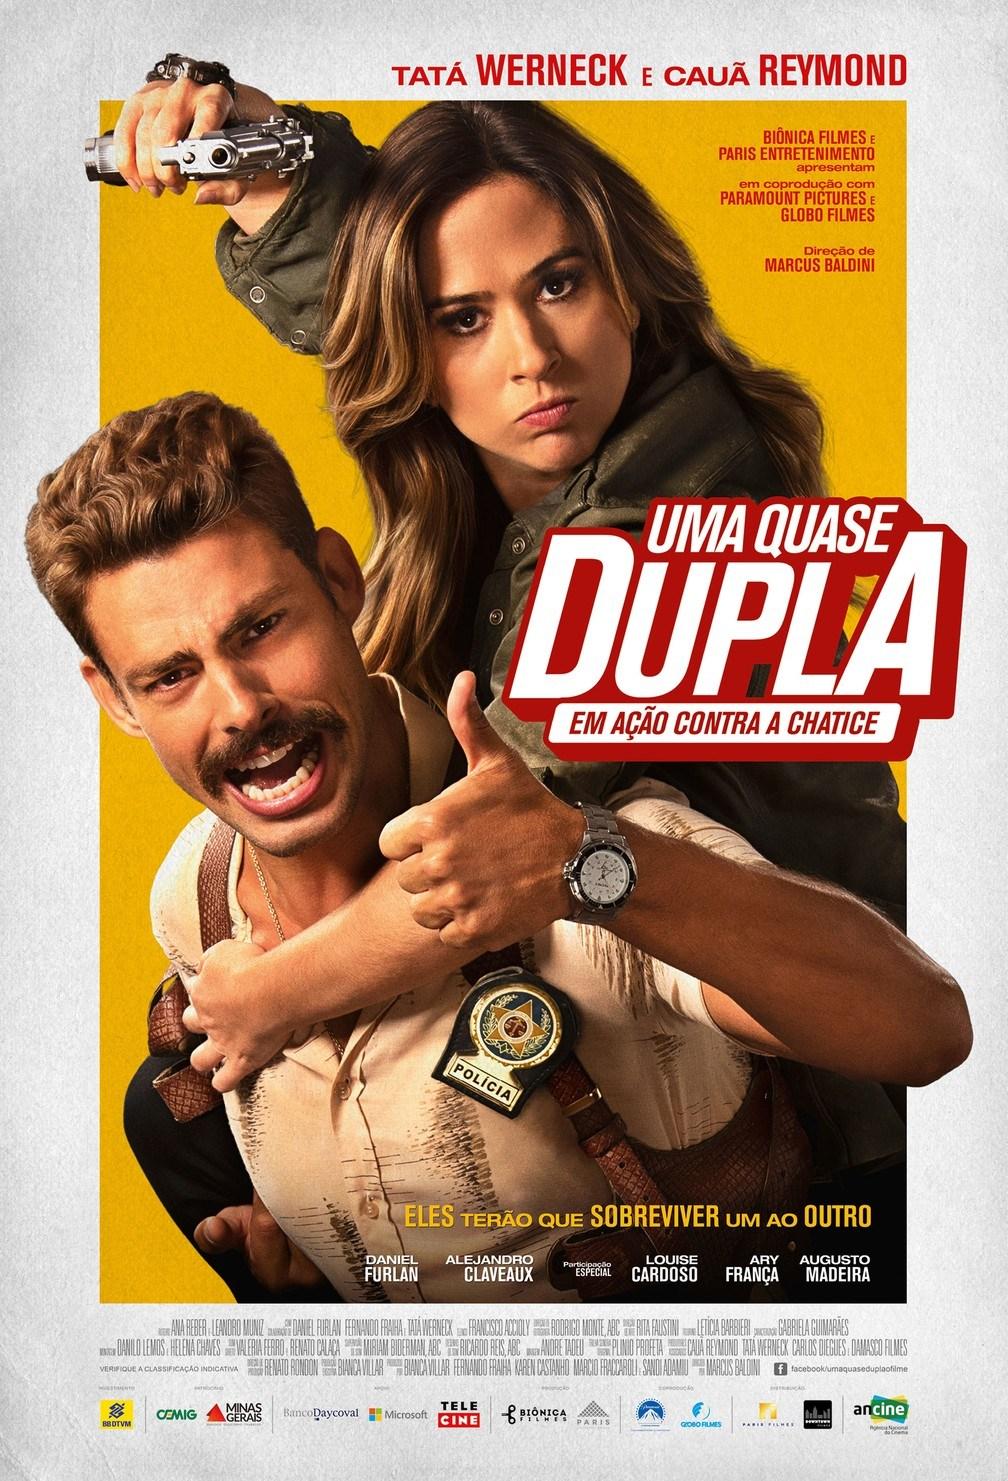 Uma Quase Dupla [Nac] – IMDB 5.2